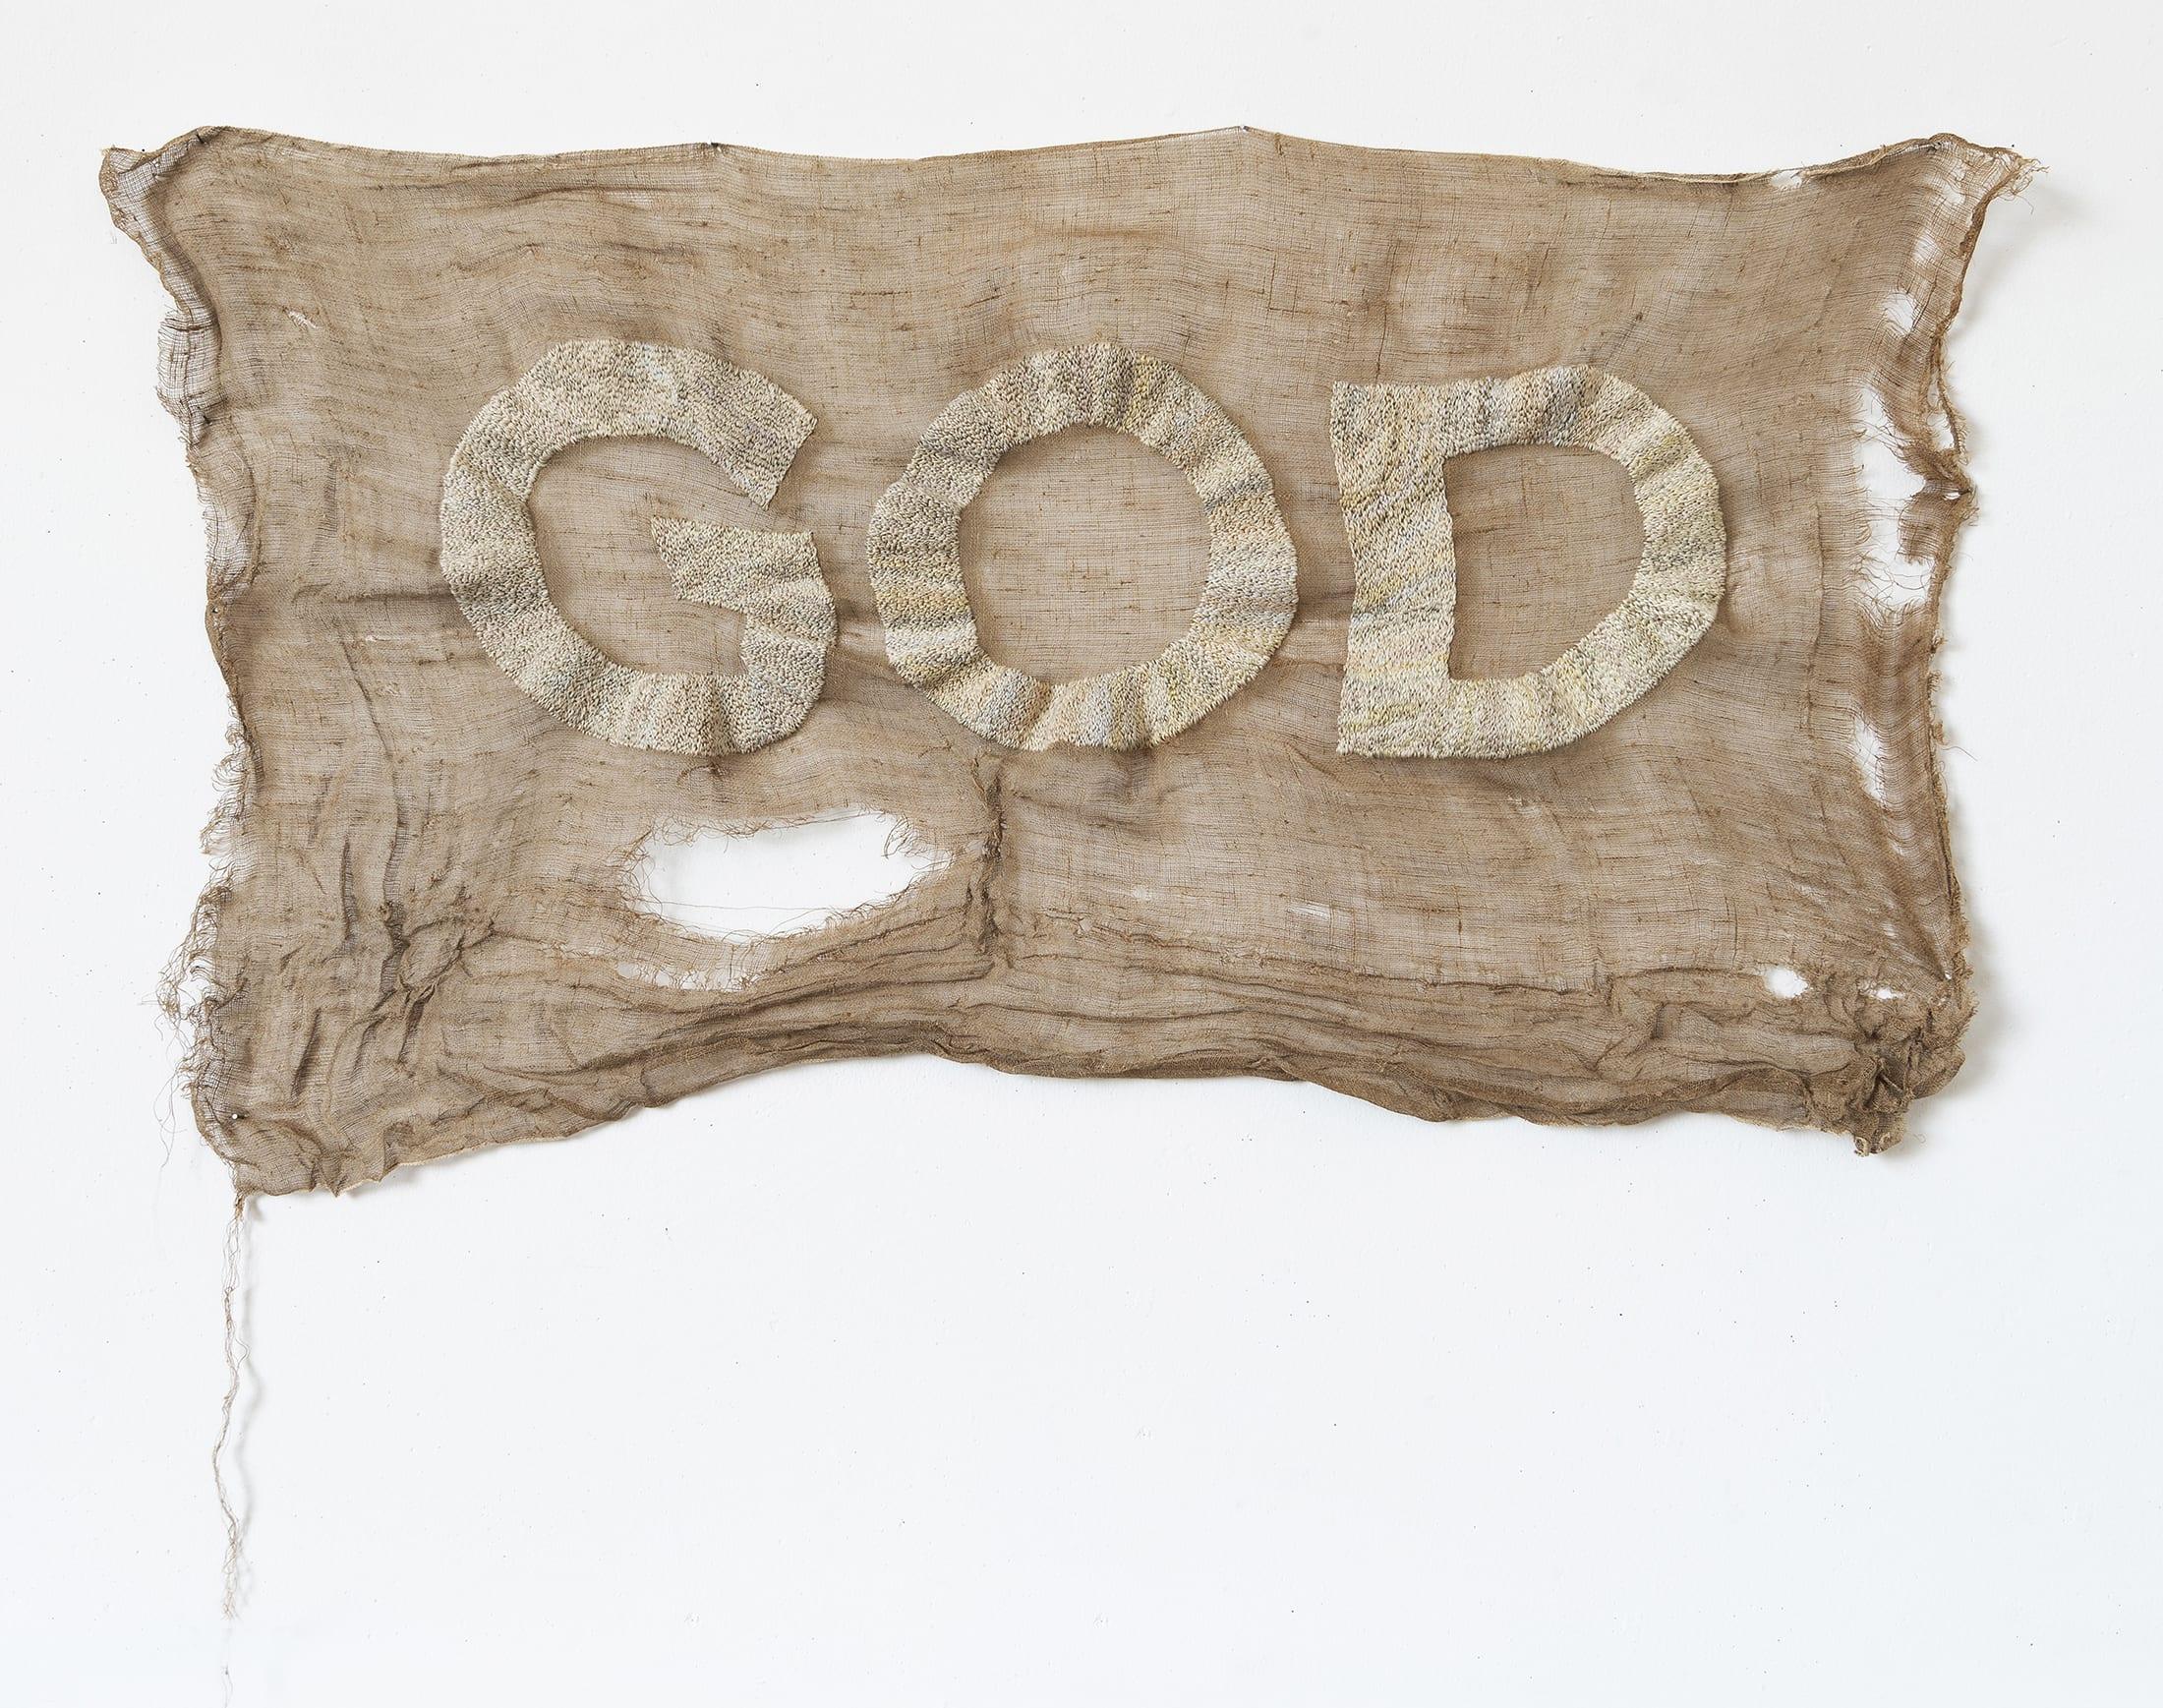 STATE silk, hessian 2019 110 x 65 cm